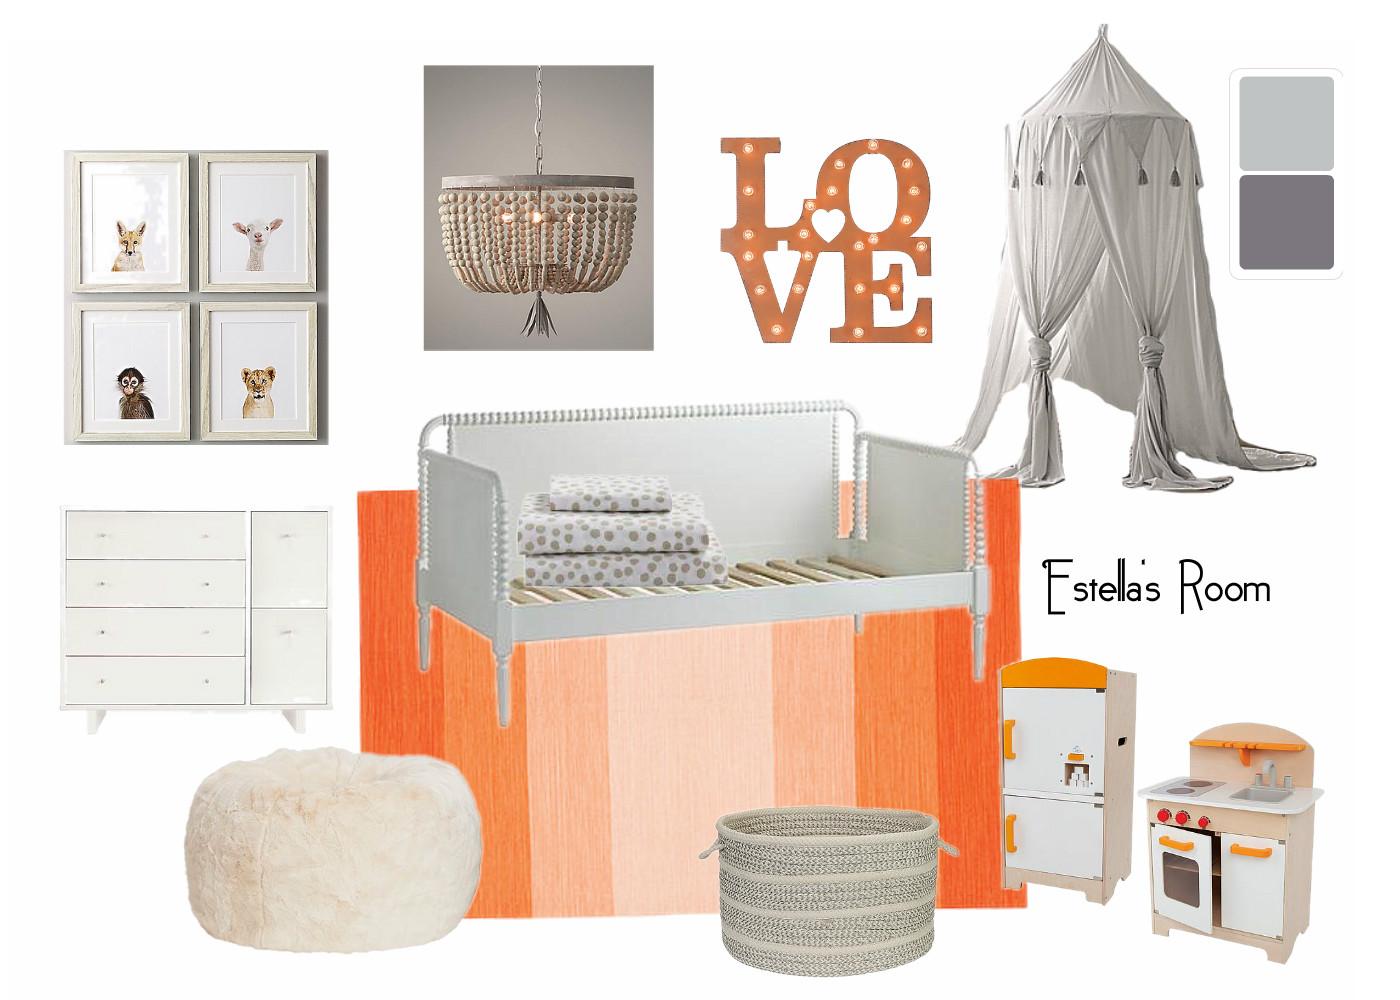 OB-Estella's Room by Faith Blakeney.jpg